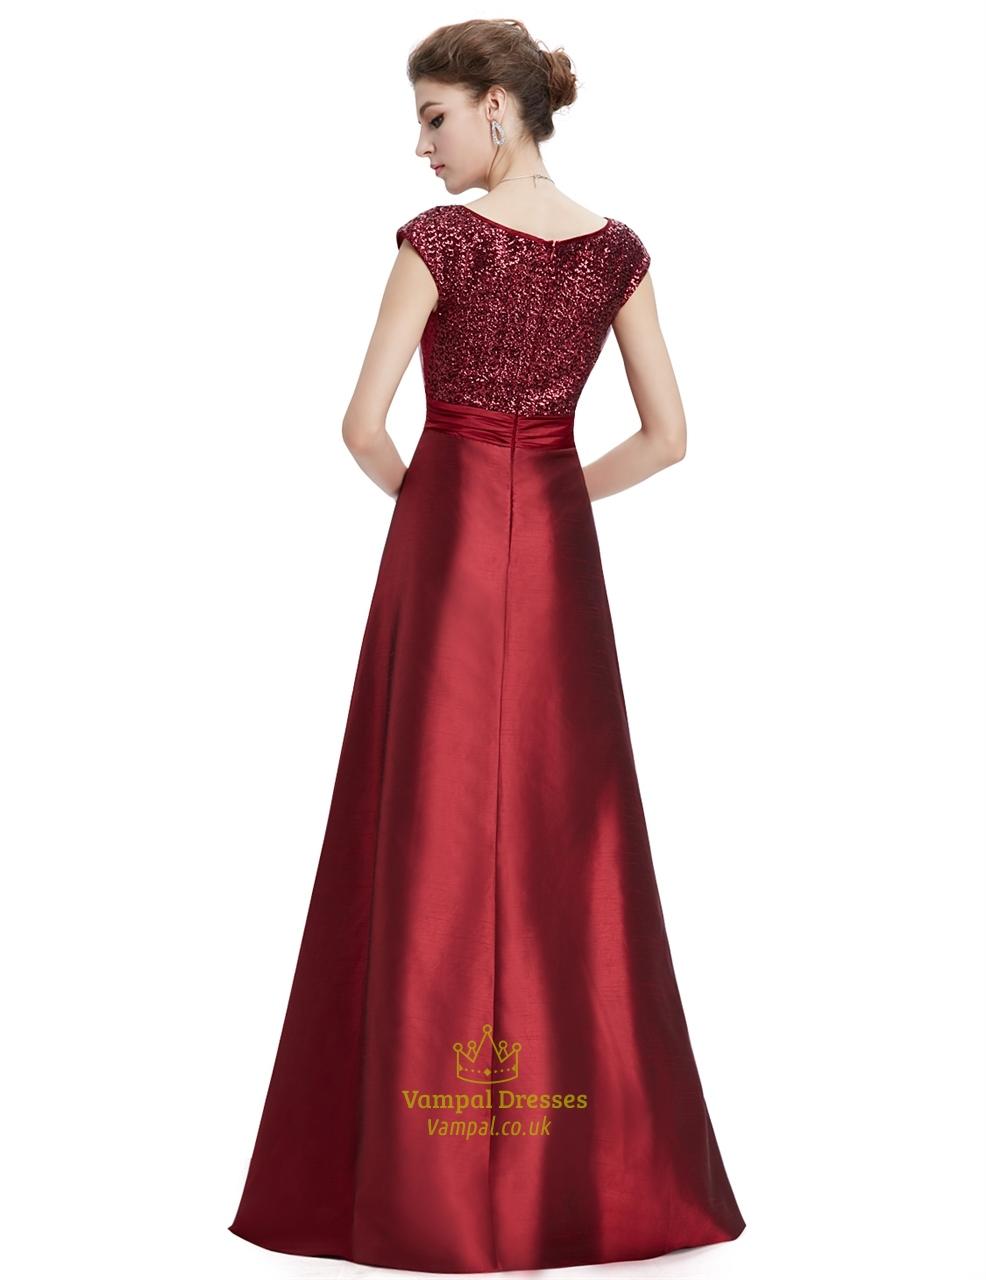 Burgundy V Neck Cap Sleeves Floor Length Prom Dresses With